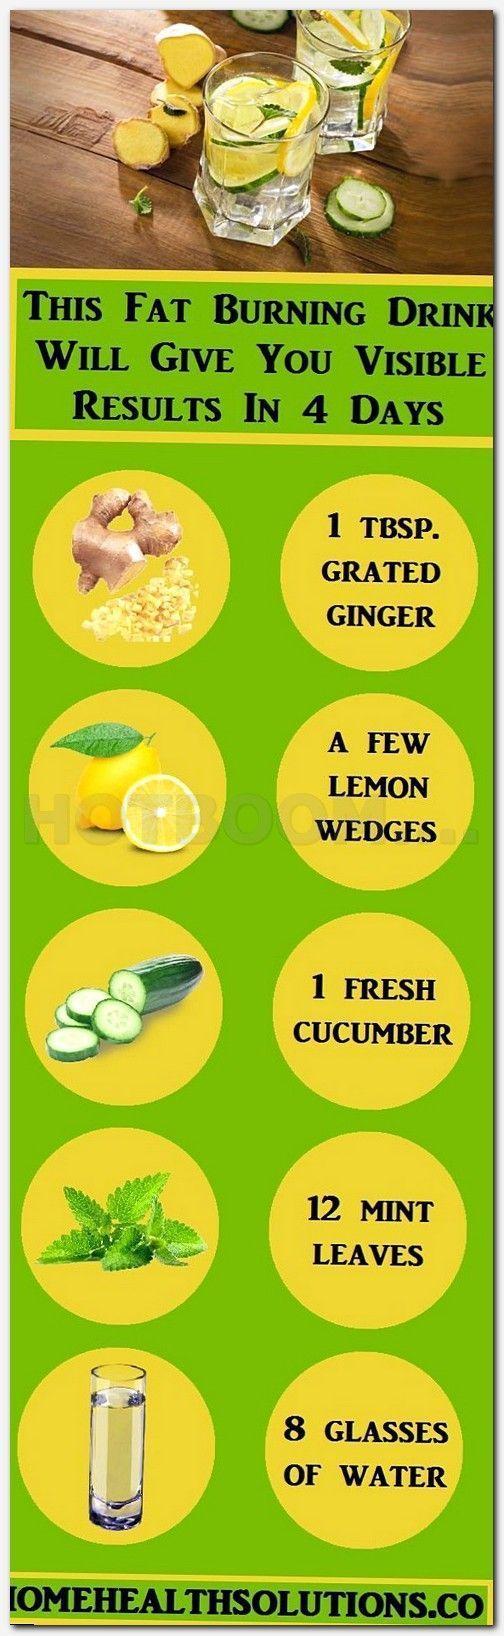 Free low carb diet meal plan